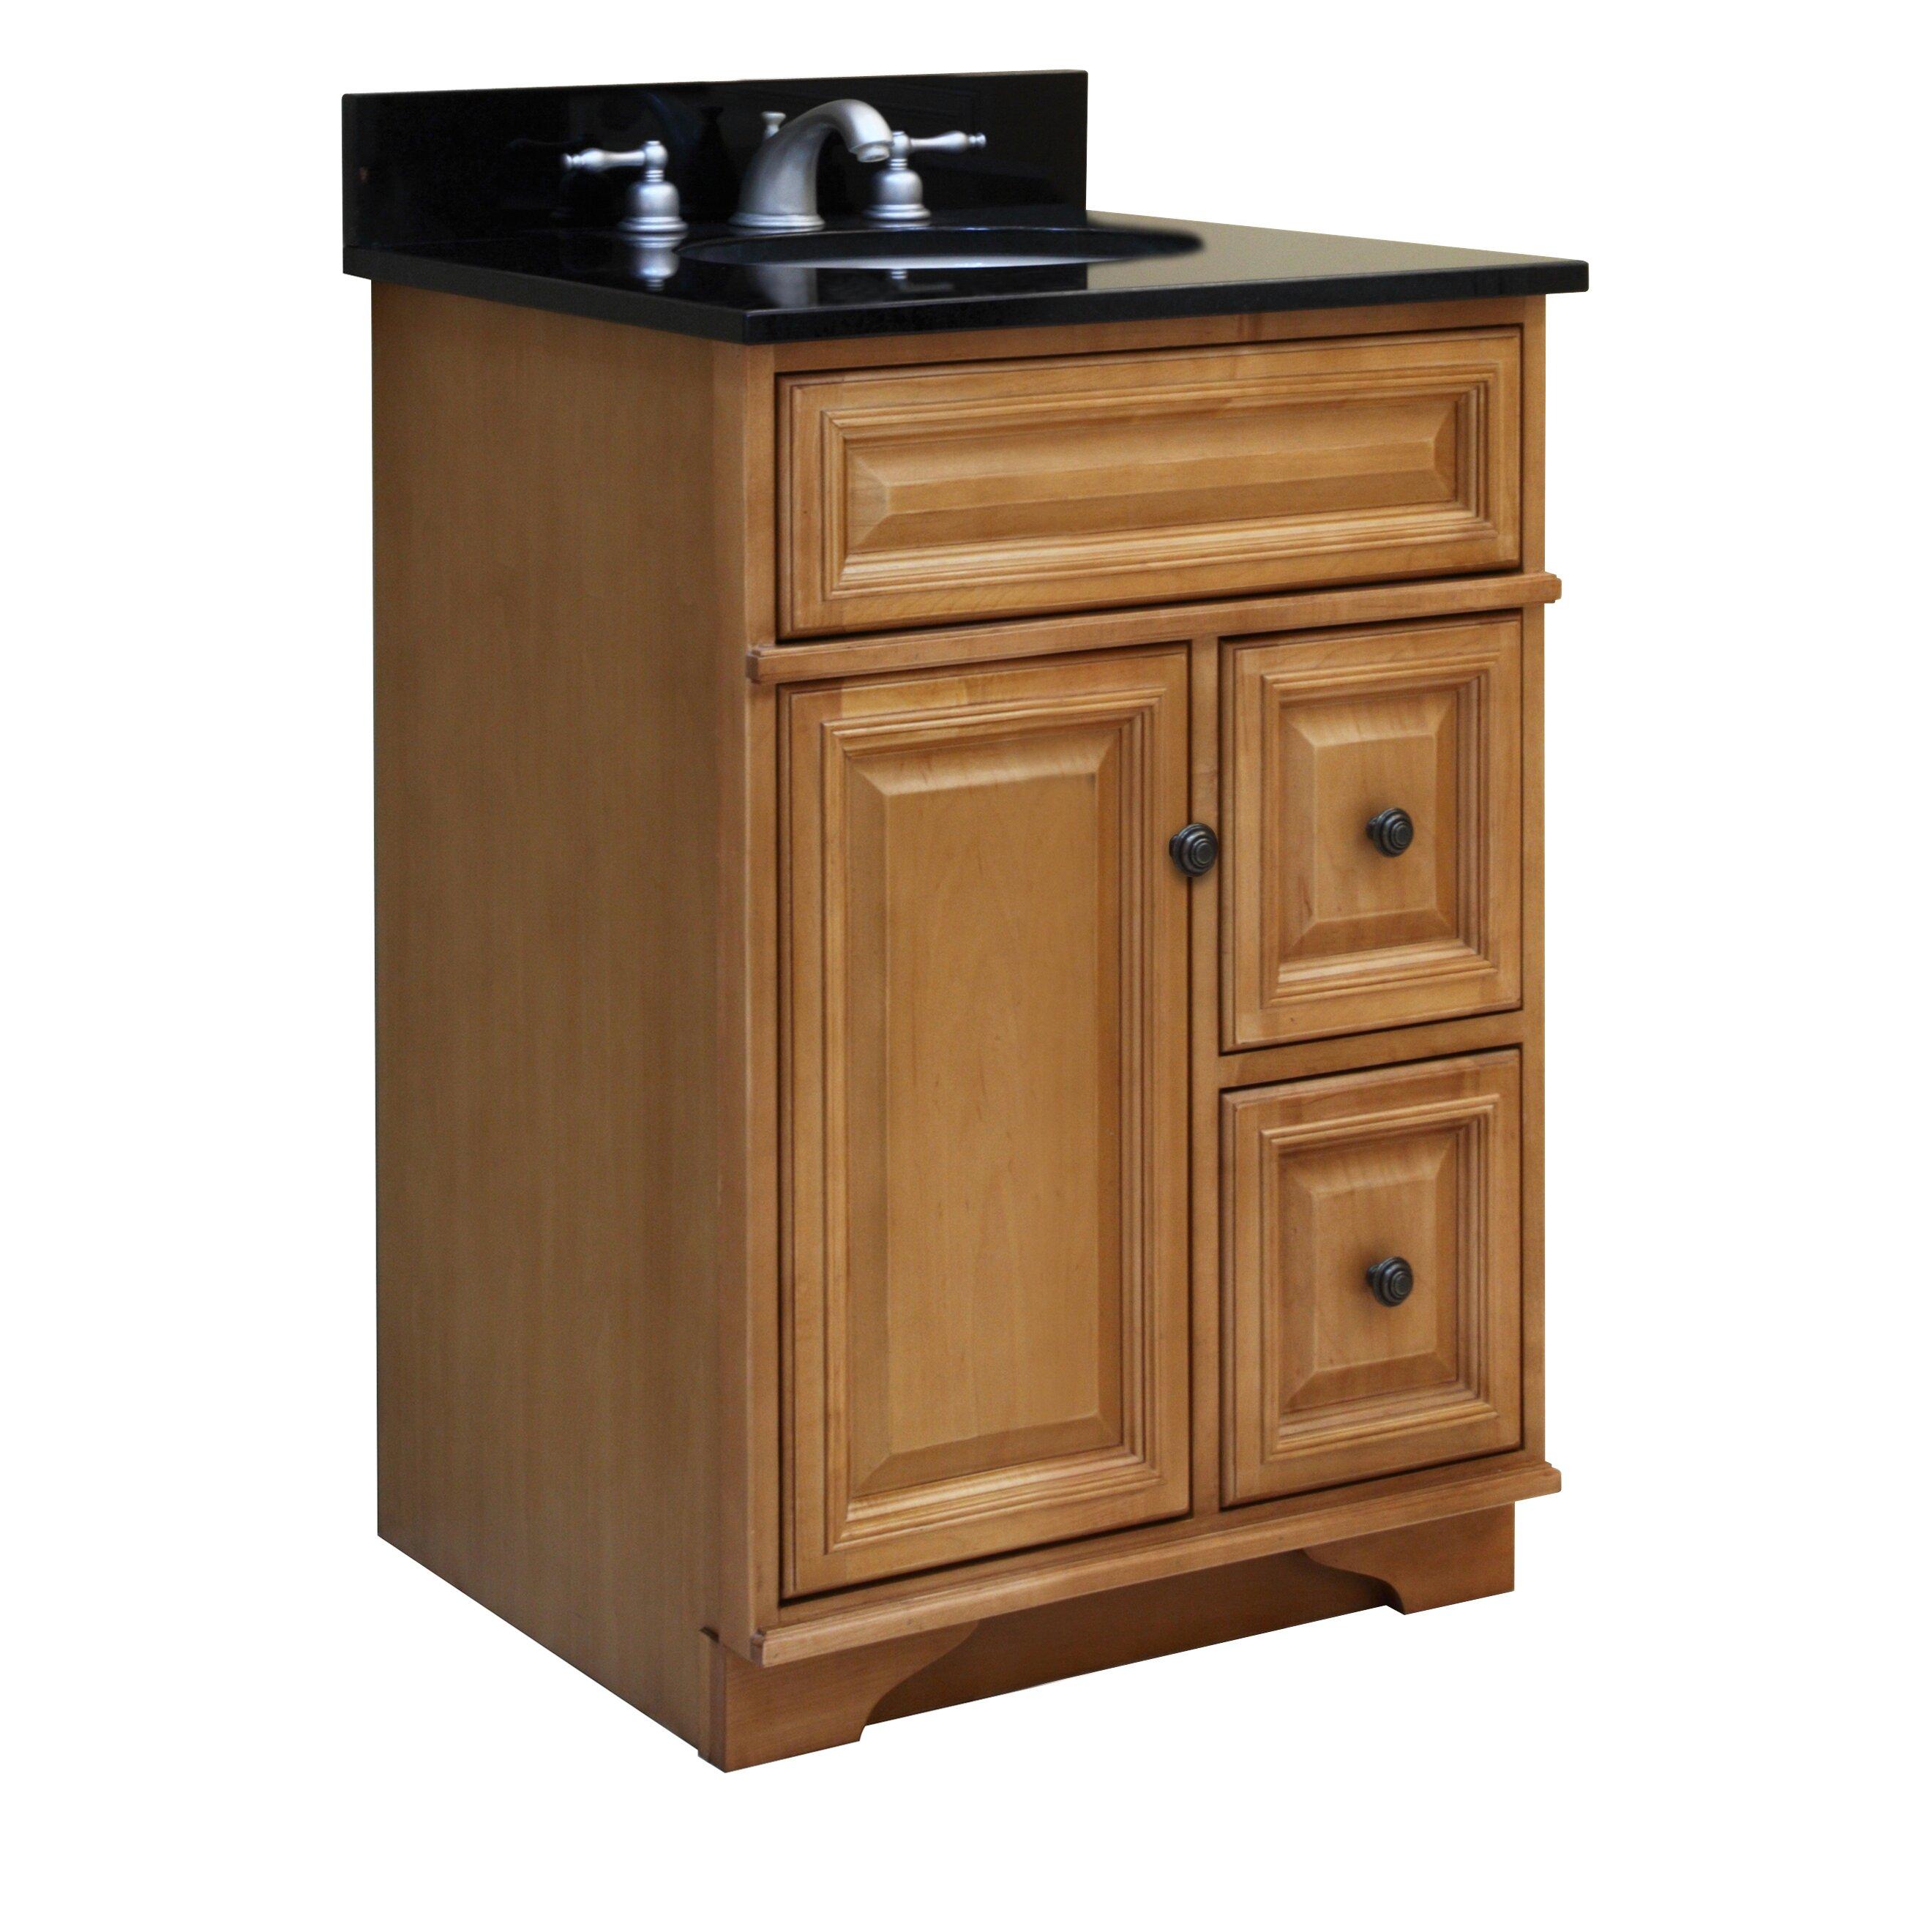 Sunnywood Kitchen Cabinets Sunny Wood Briarwood 24 Bathroom Vanity Base Reviews Wayfair